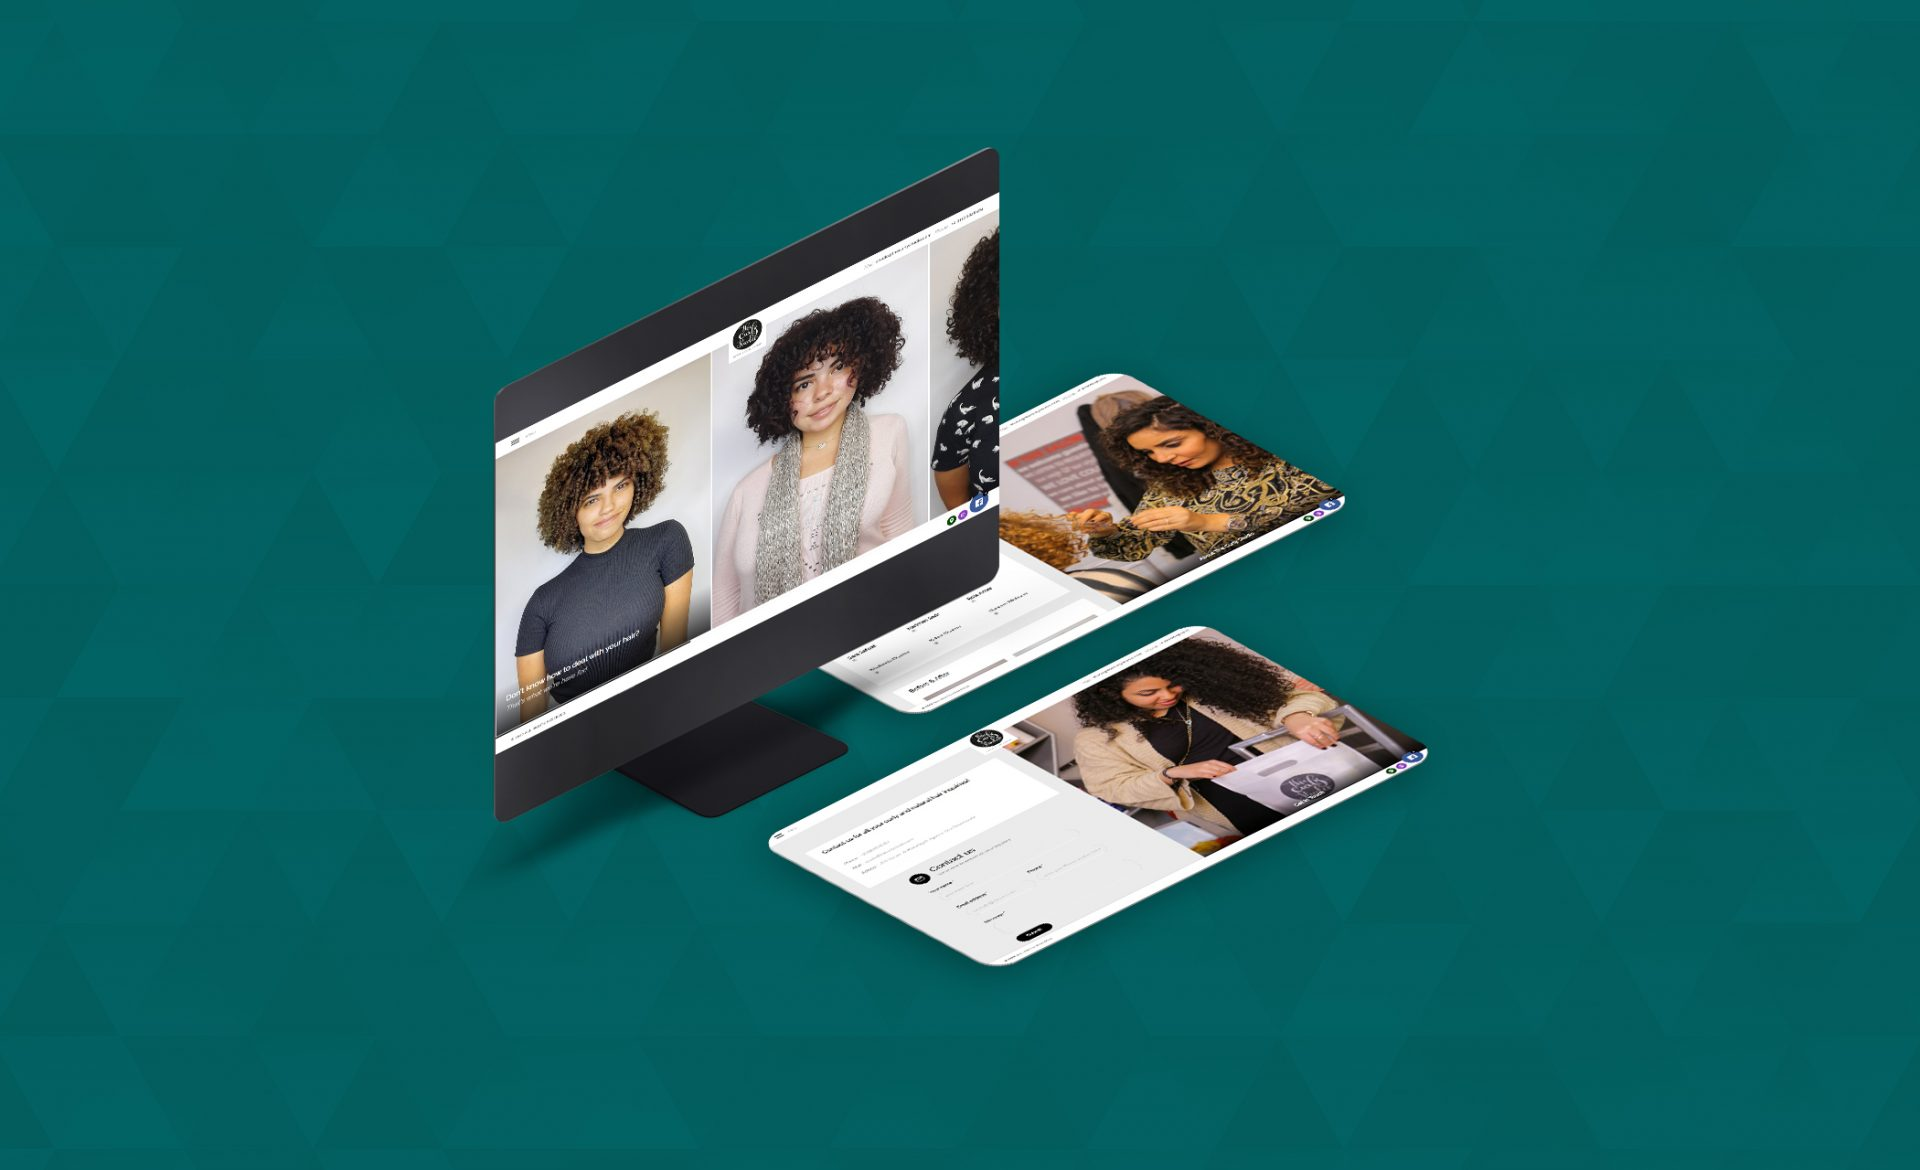 The Curly Studio Site